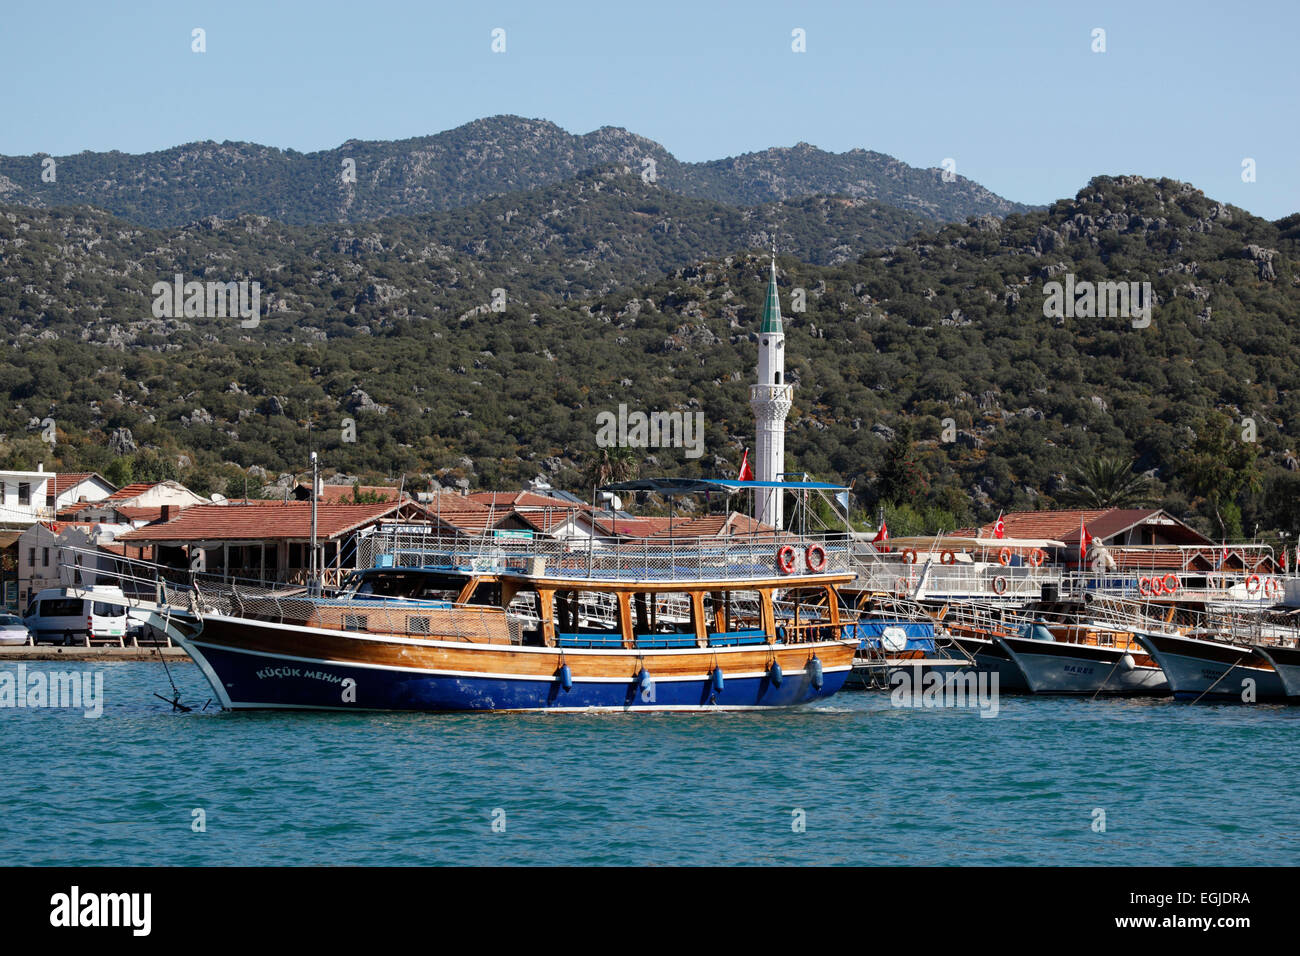 Ucagiz, near Kas, Lycia, Antalya Province, Mediterranean Coast, Southwest Turkey, Turkey, Asia - Stock Image